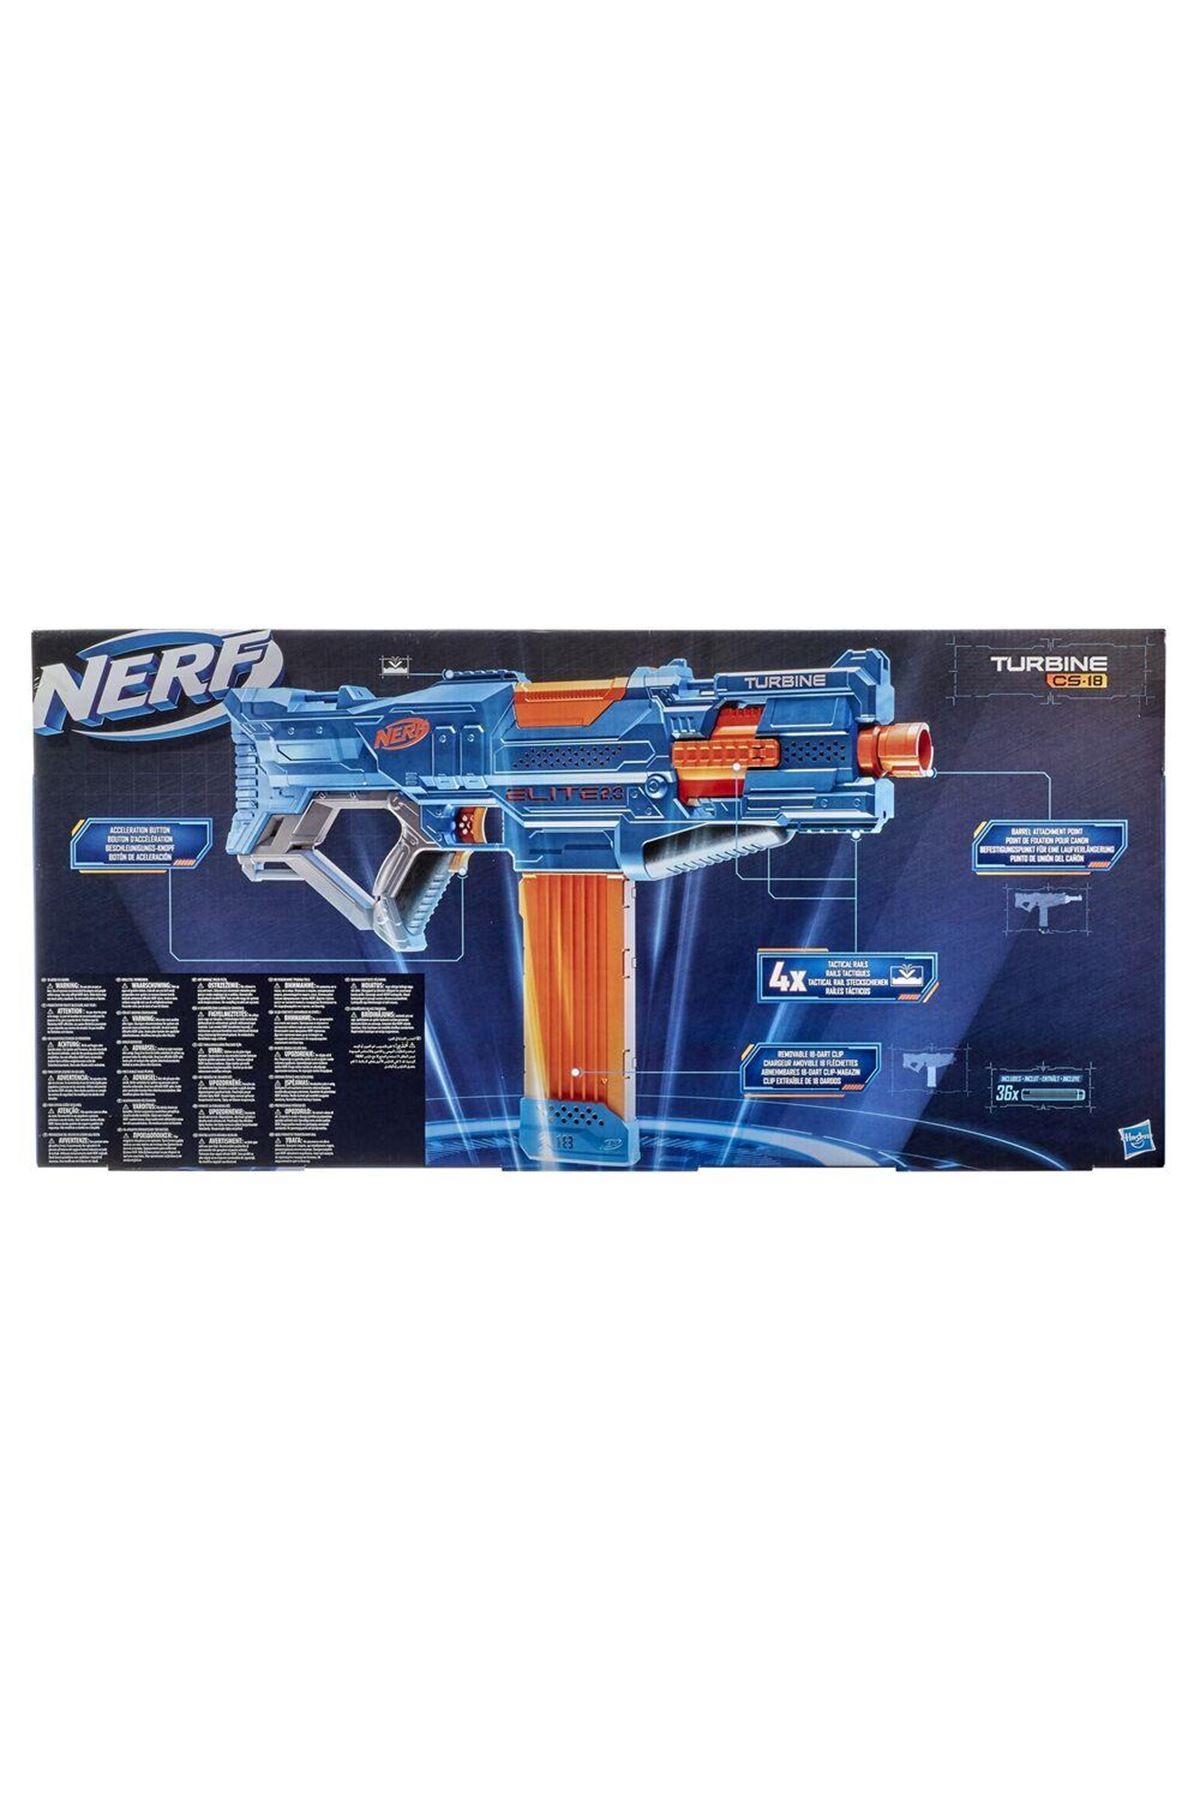 Nerf Elite 2.0 Turbine CS-18 E9481